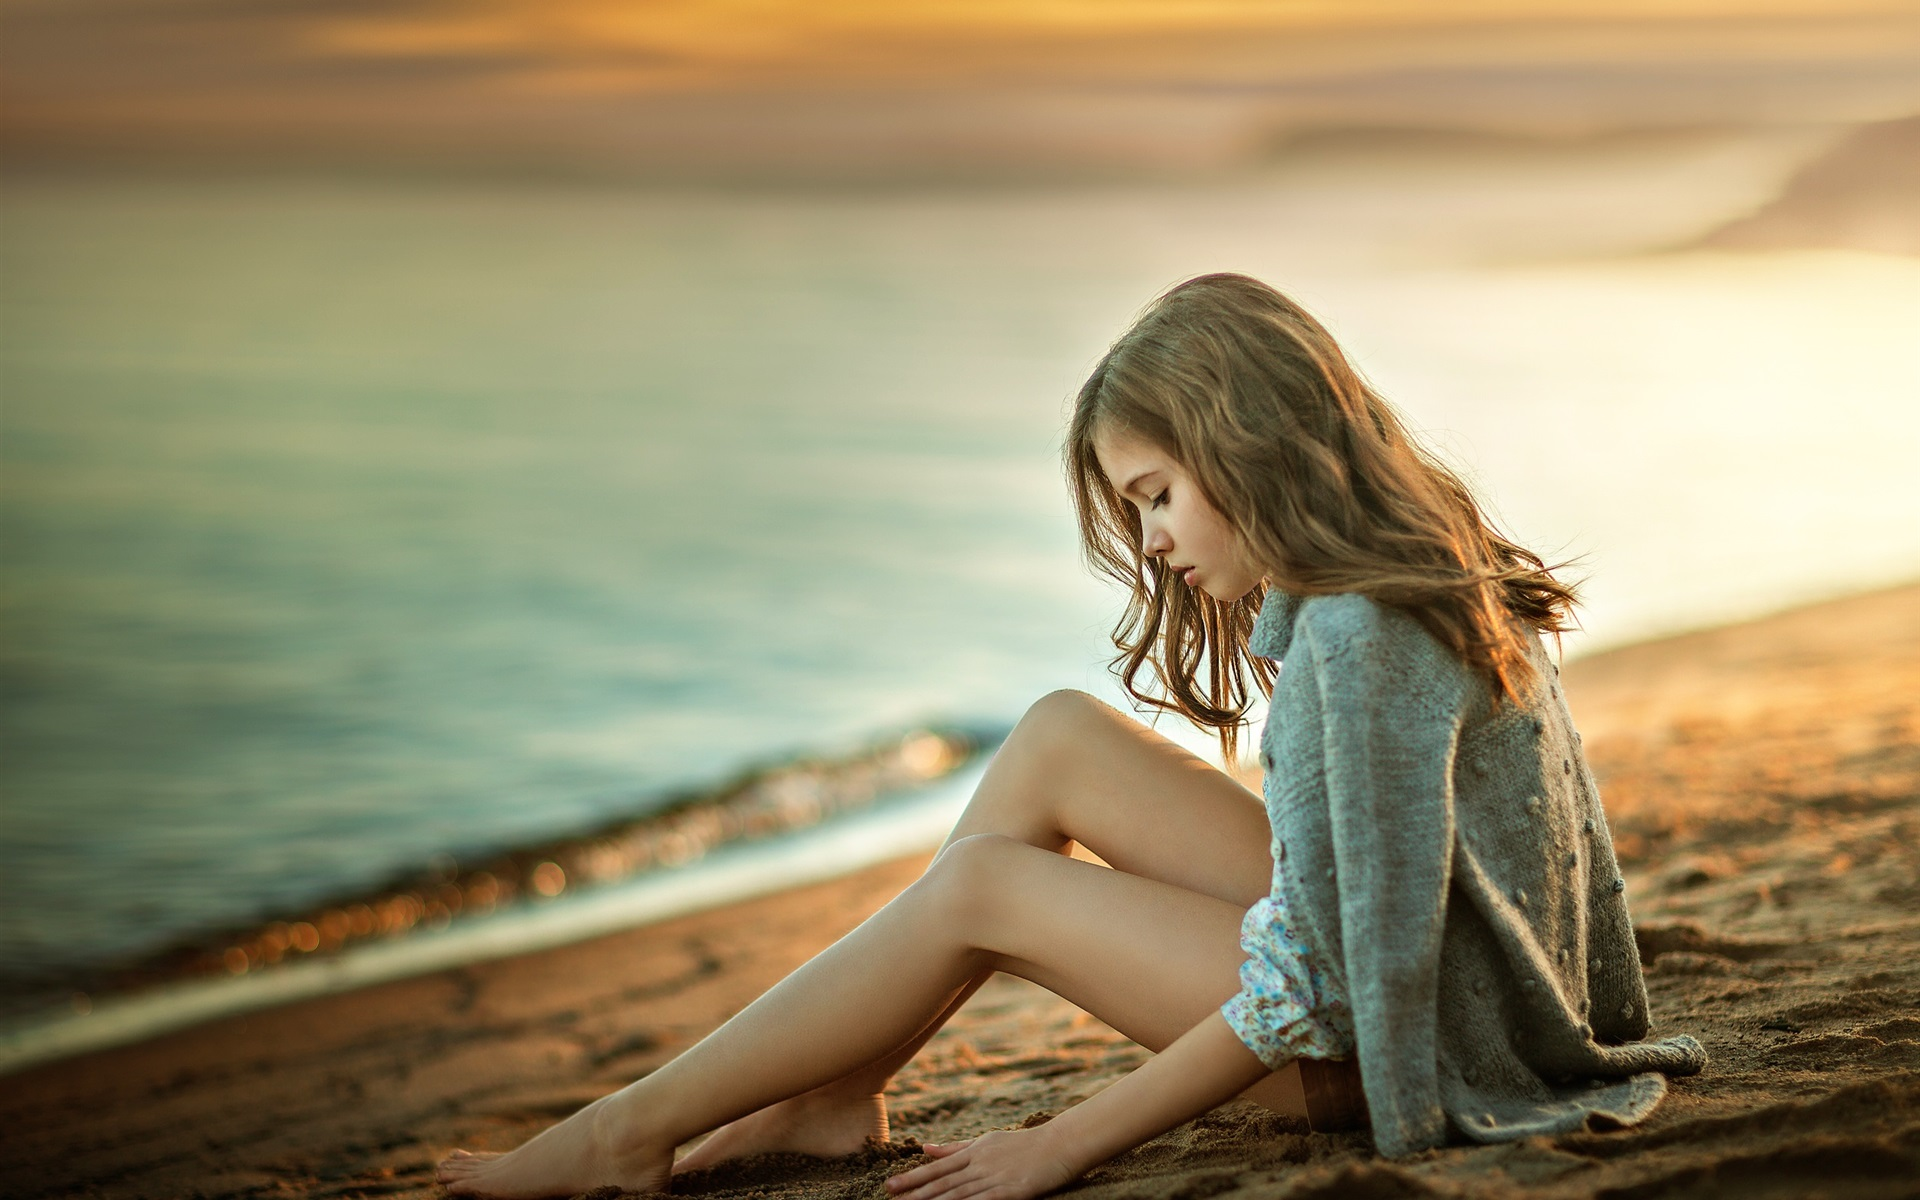 меня фото где девушка сидит на море покуда эта